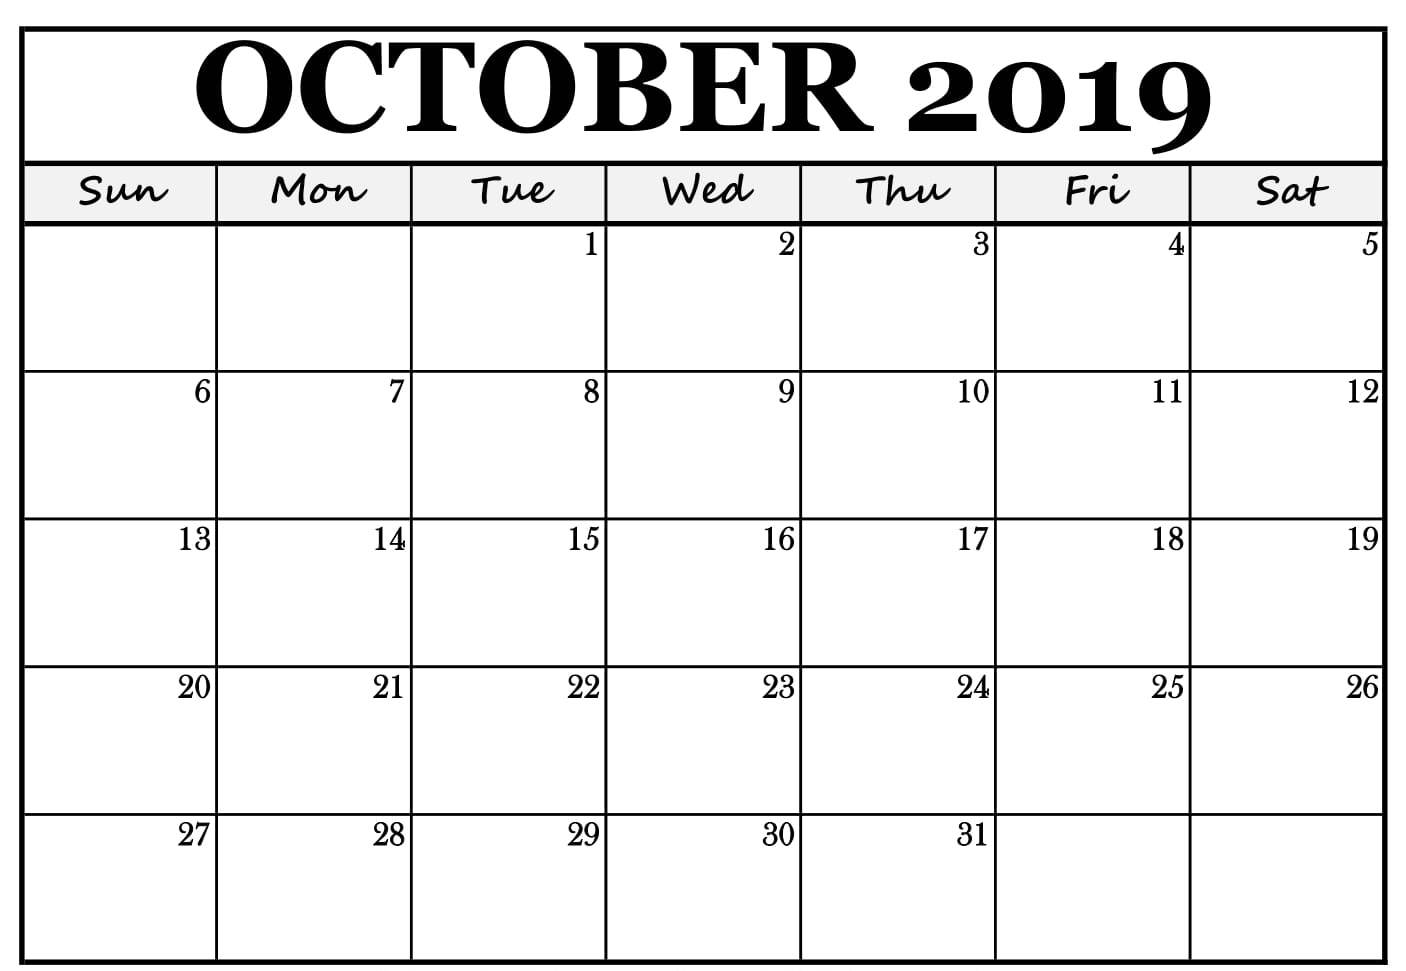 October 2019 Calendar Printable Template